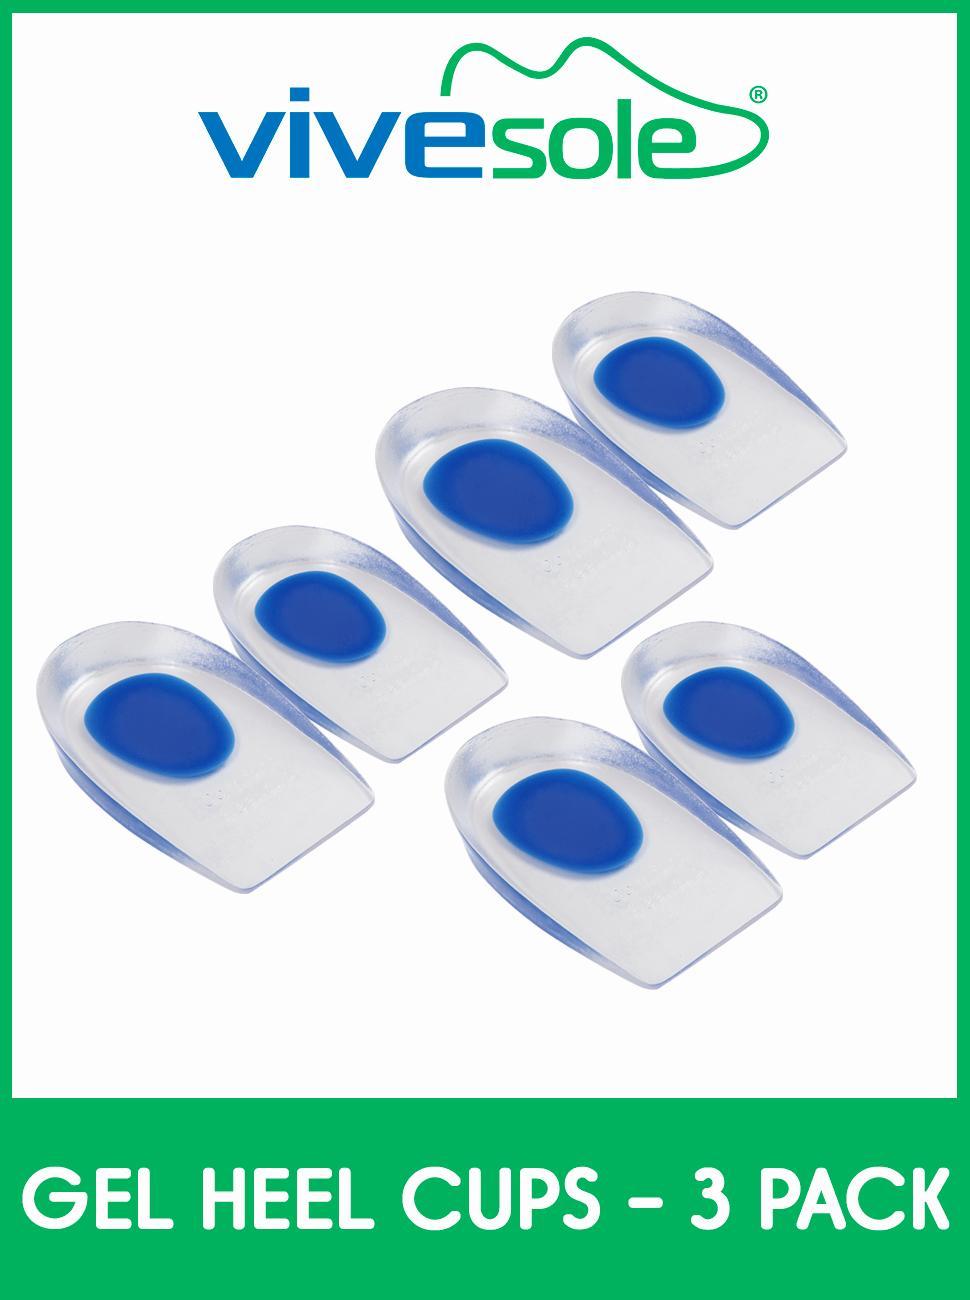 ViveSole Silicone Gel Heel Cups - Shoe Inserts for Plantar Fasciitis, Sore Heel, Bone Spur